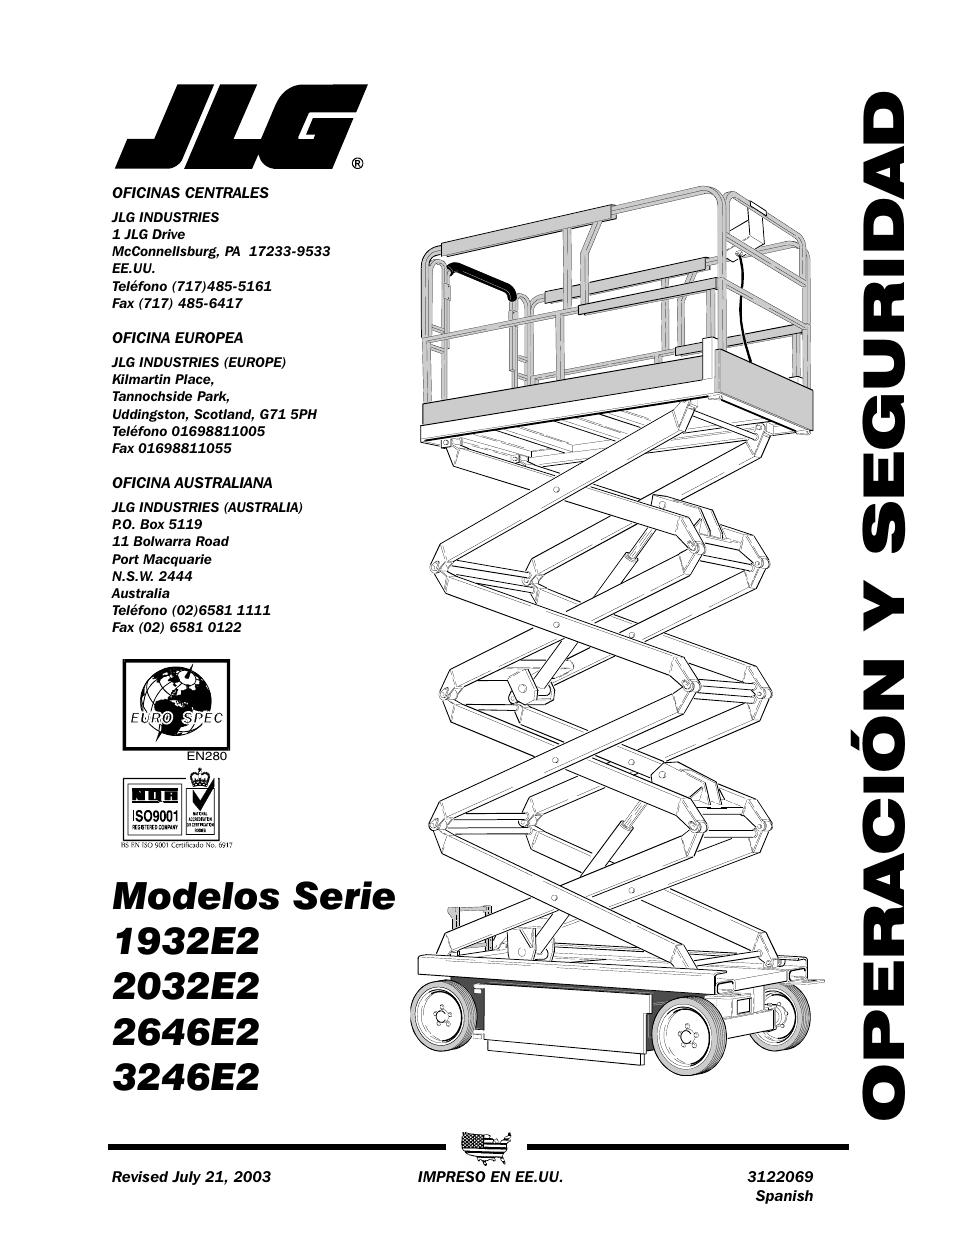 medium resolution of jlg 3246e2 operator manual manual del usuario p ginas 44 rh pdfmanuales com jlg 1932e2 batteries